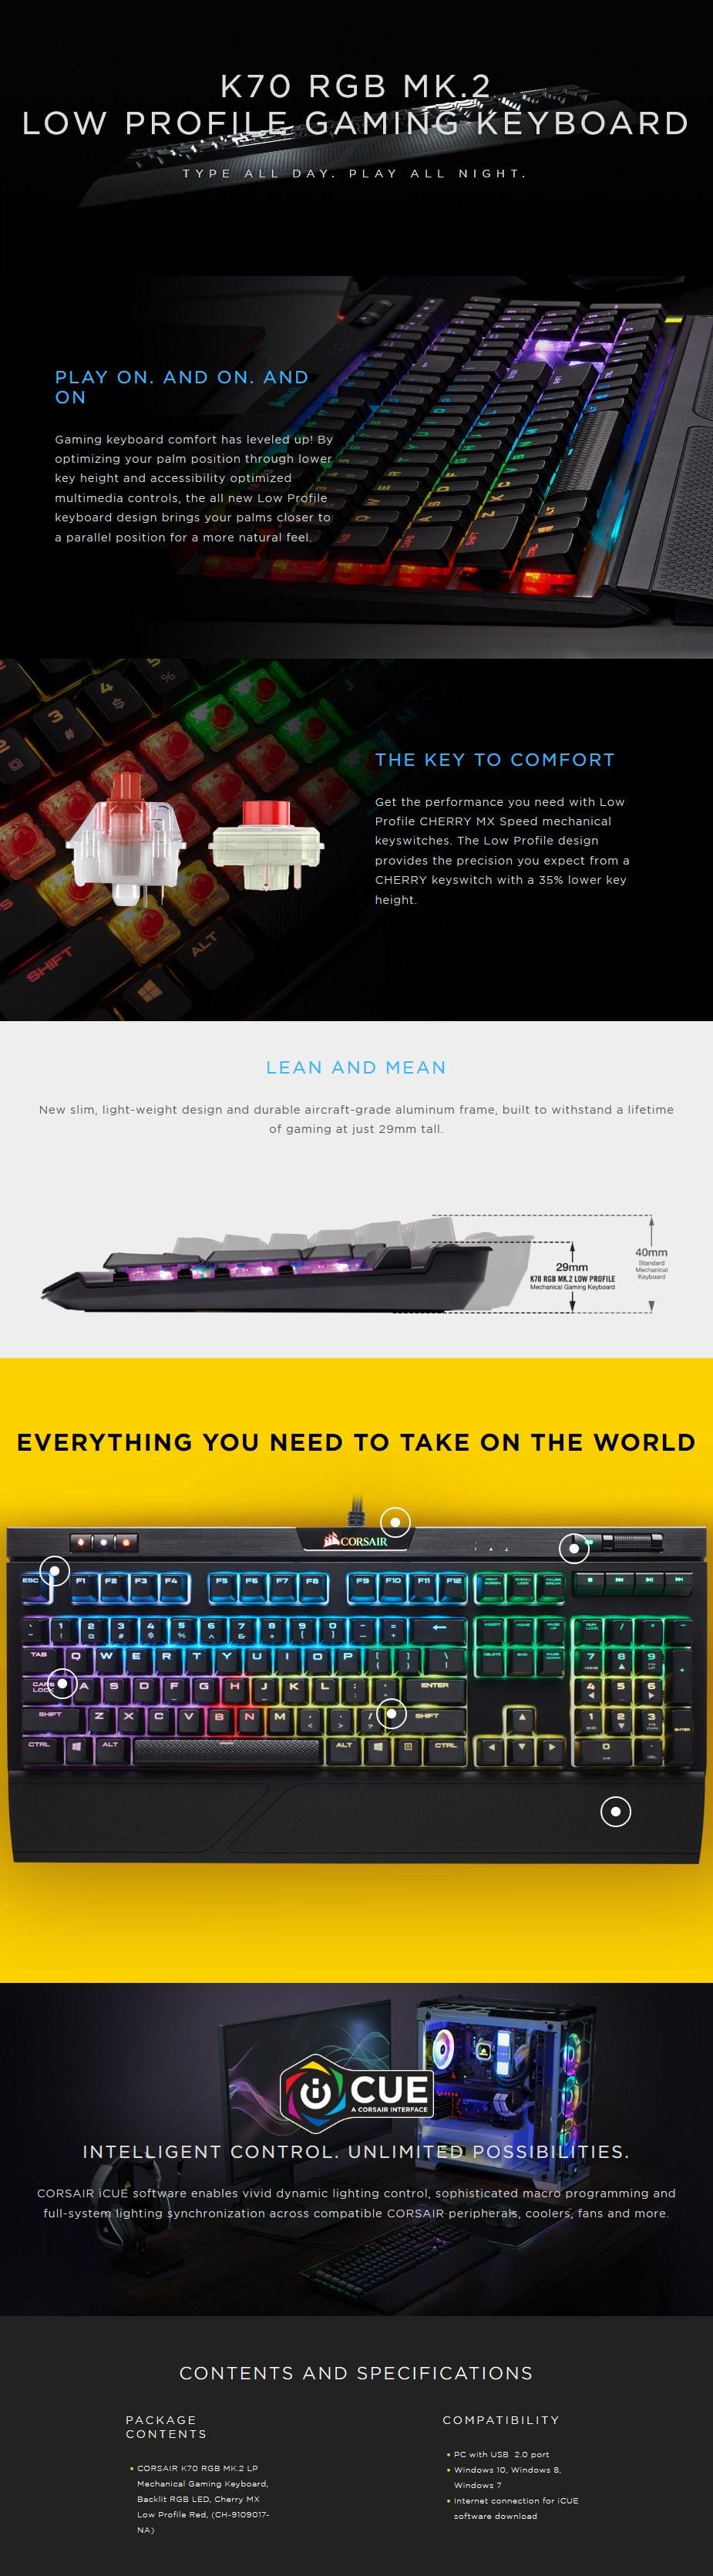 Corsair K70 RGB MK.2 Rapidfire Low Profile Gaming Keyboard - Desktop Overview 1